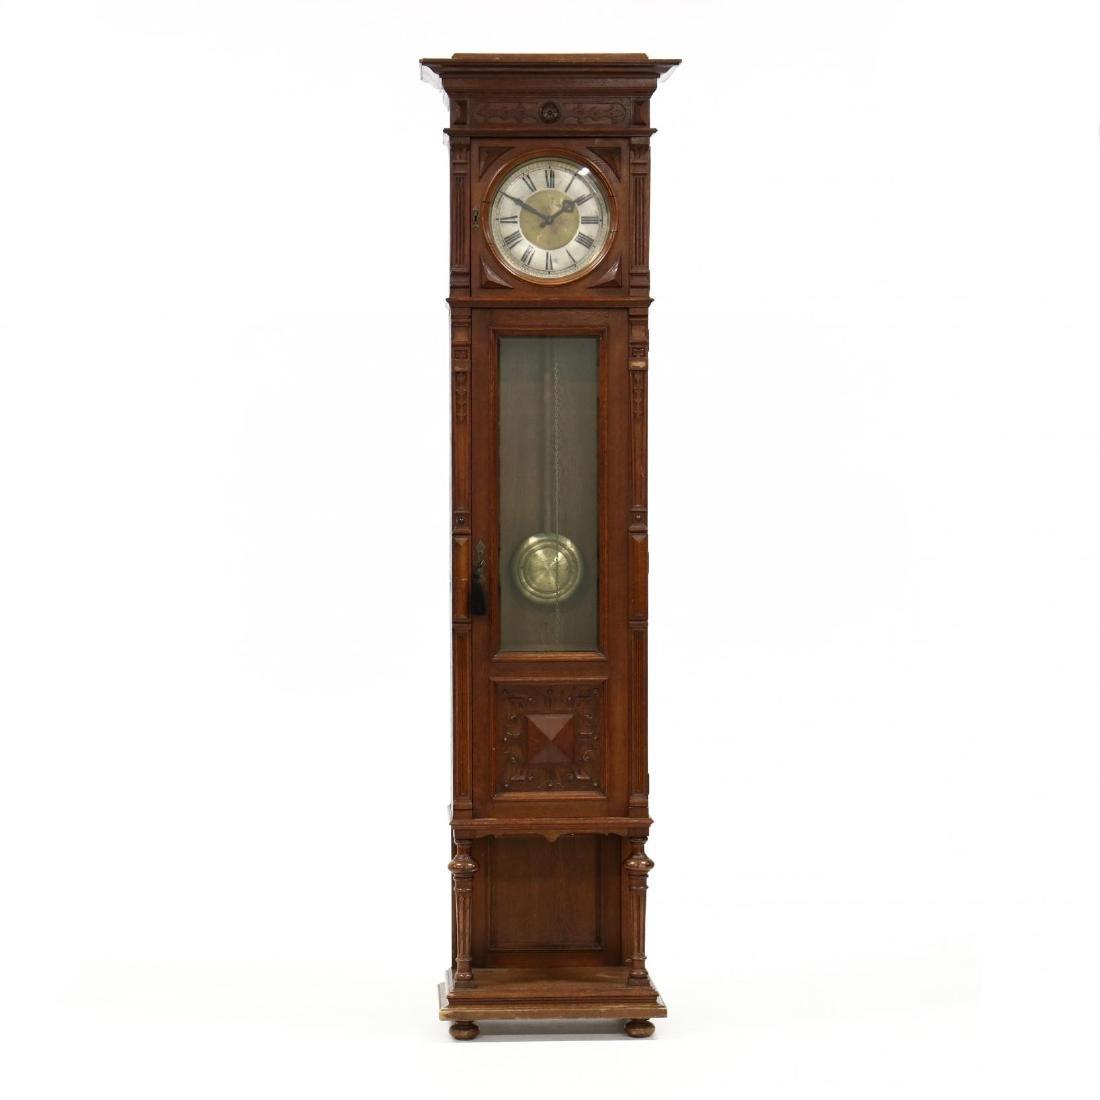 Antique German Tall Case Clock